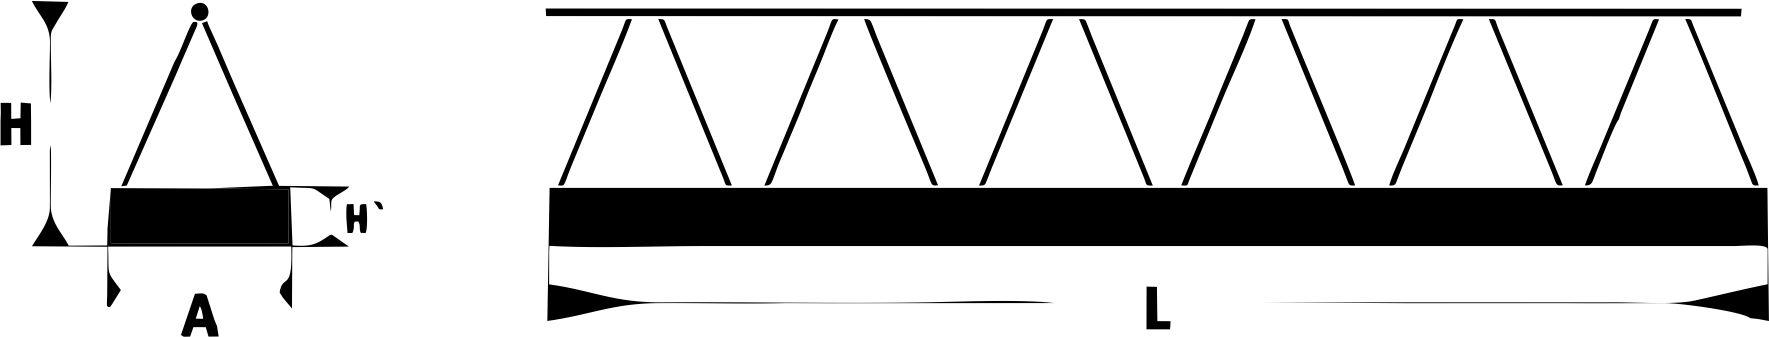 belka-teriva-11